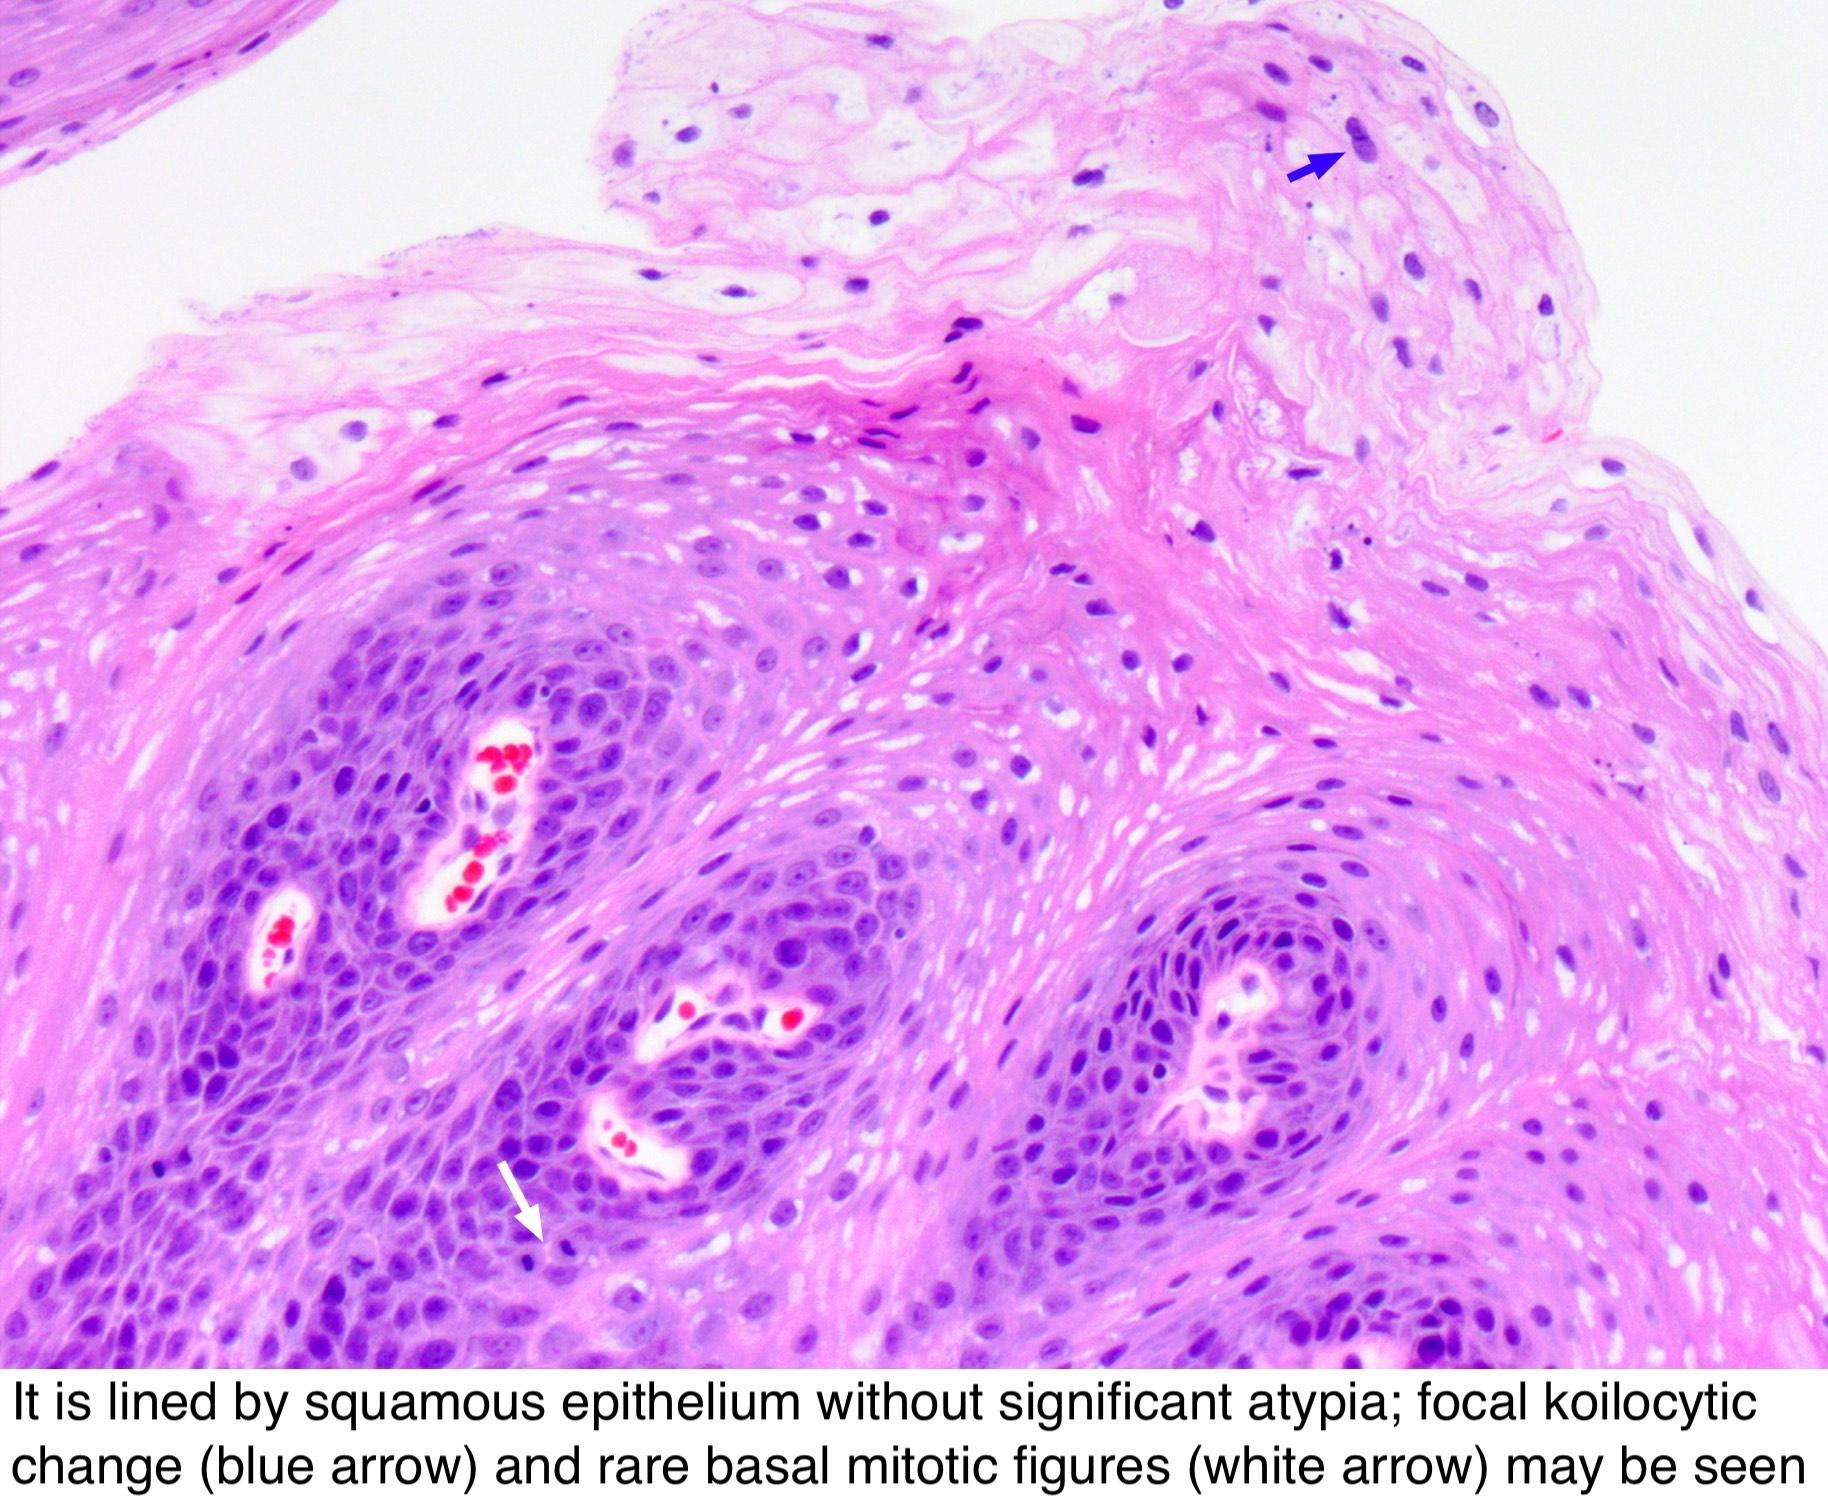 puppy papillomavirus cancer male feminine